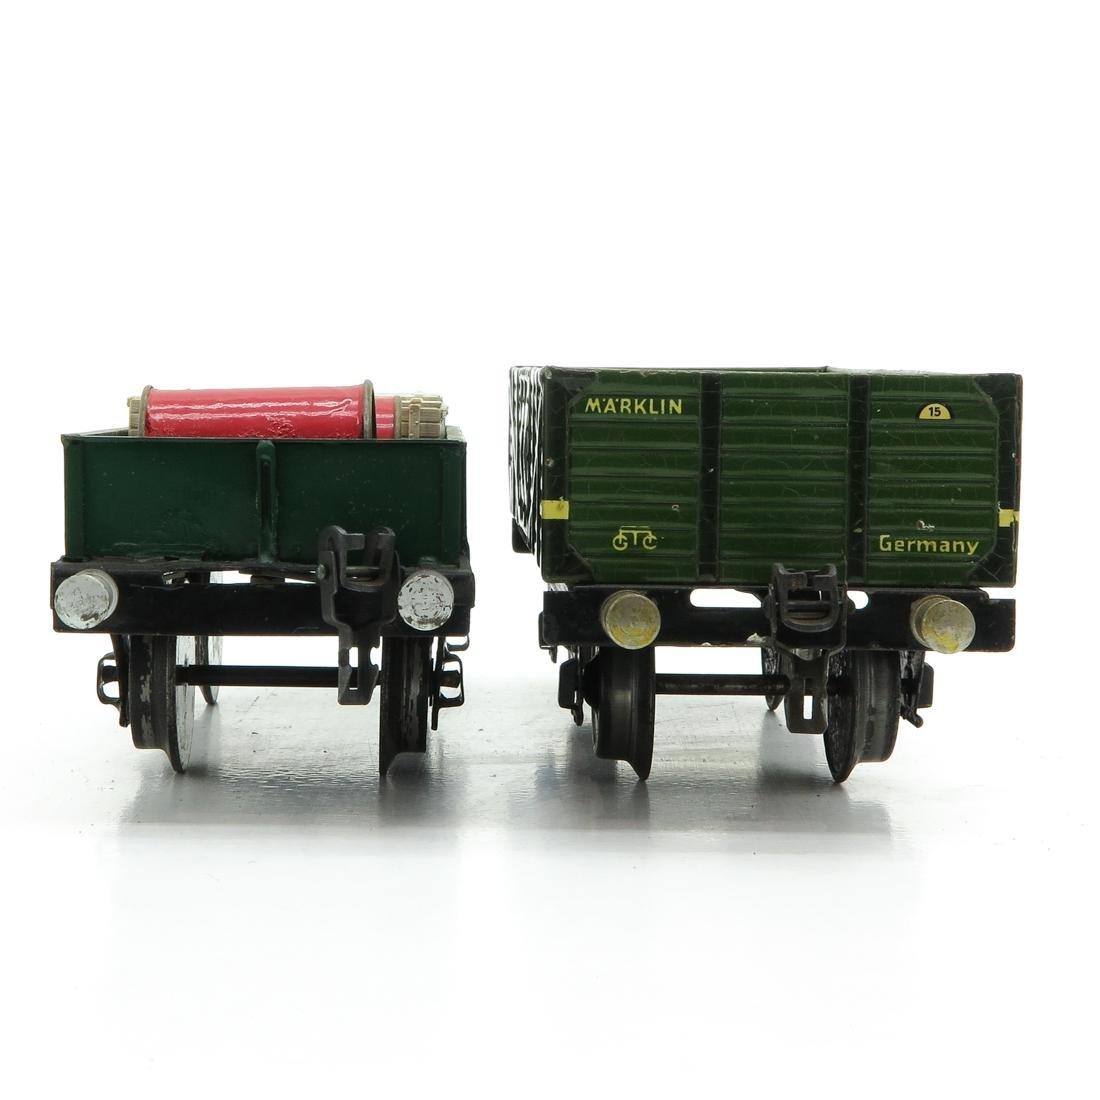 Lot of 2 Vintage Marklin Wagons - 2